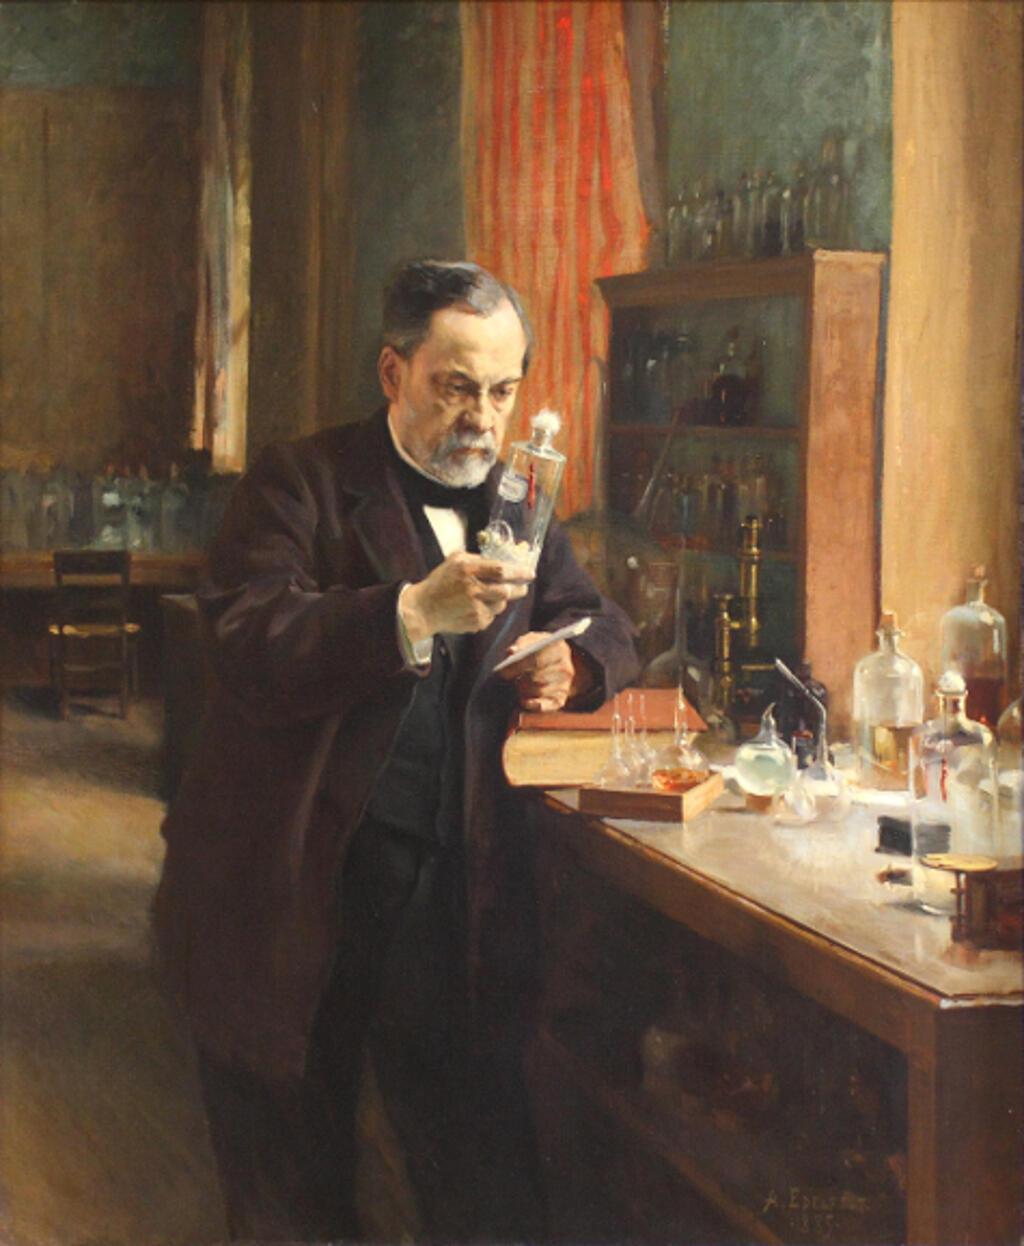 Louis Pasteur- Albert Edelfelt